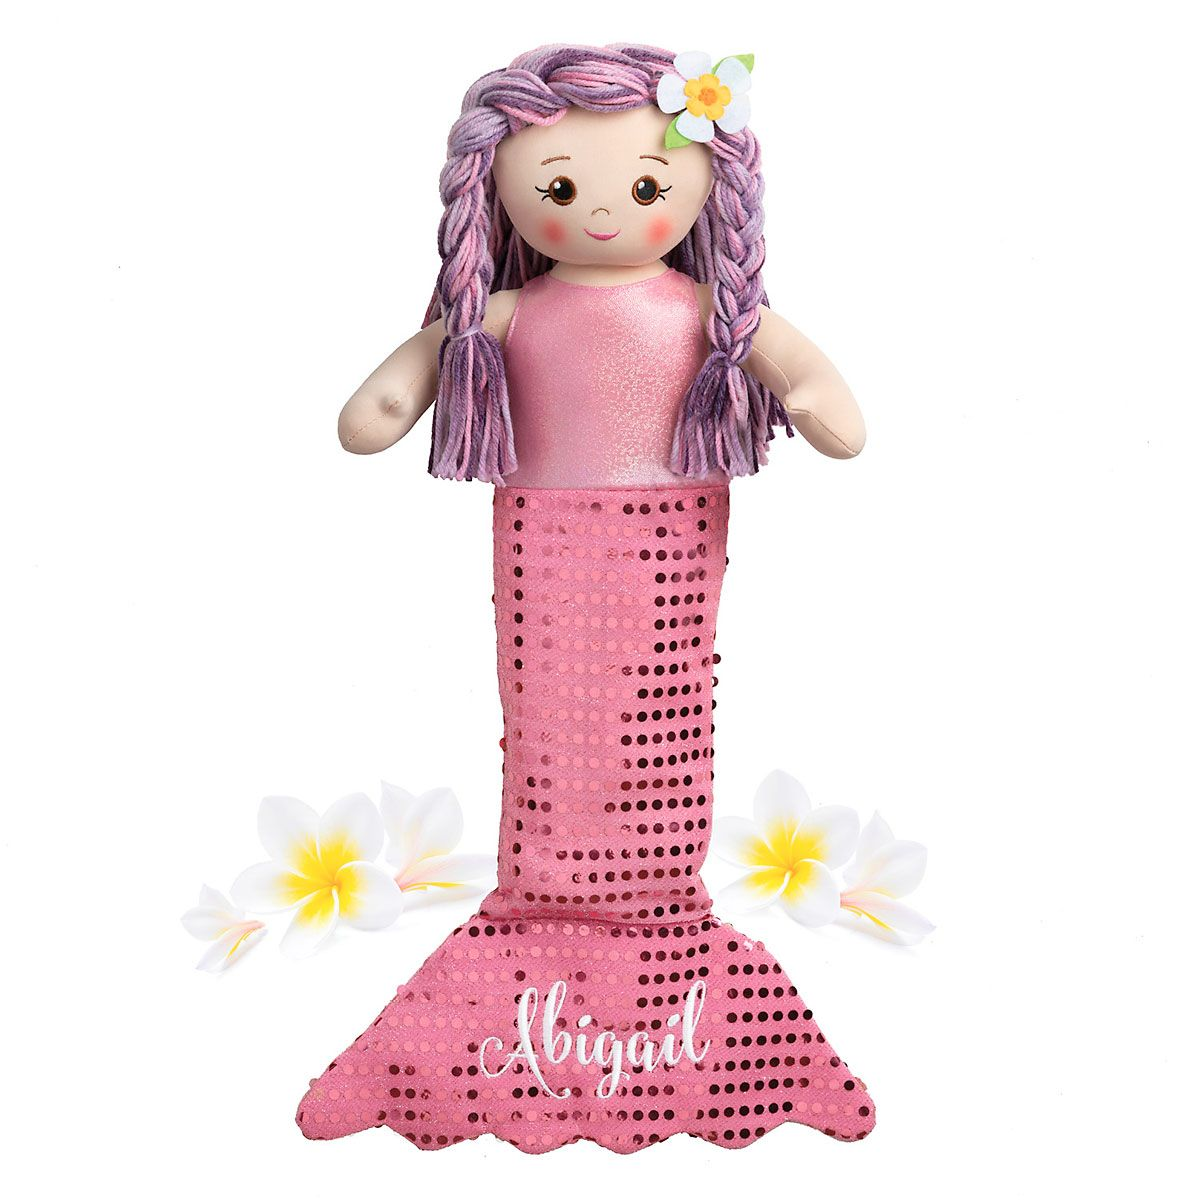 Personalized Mermaid Rag Doll